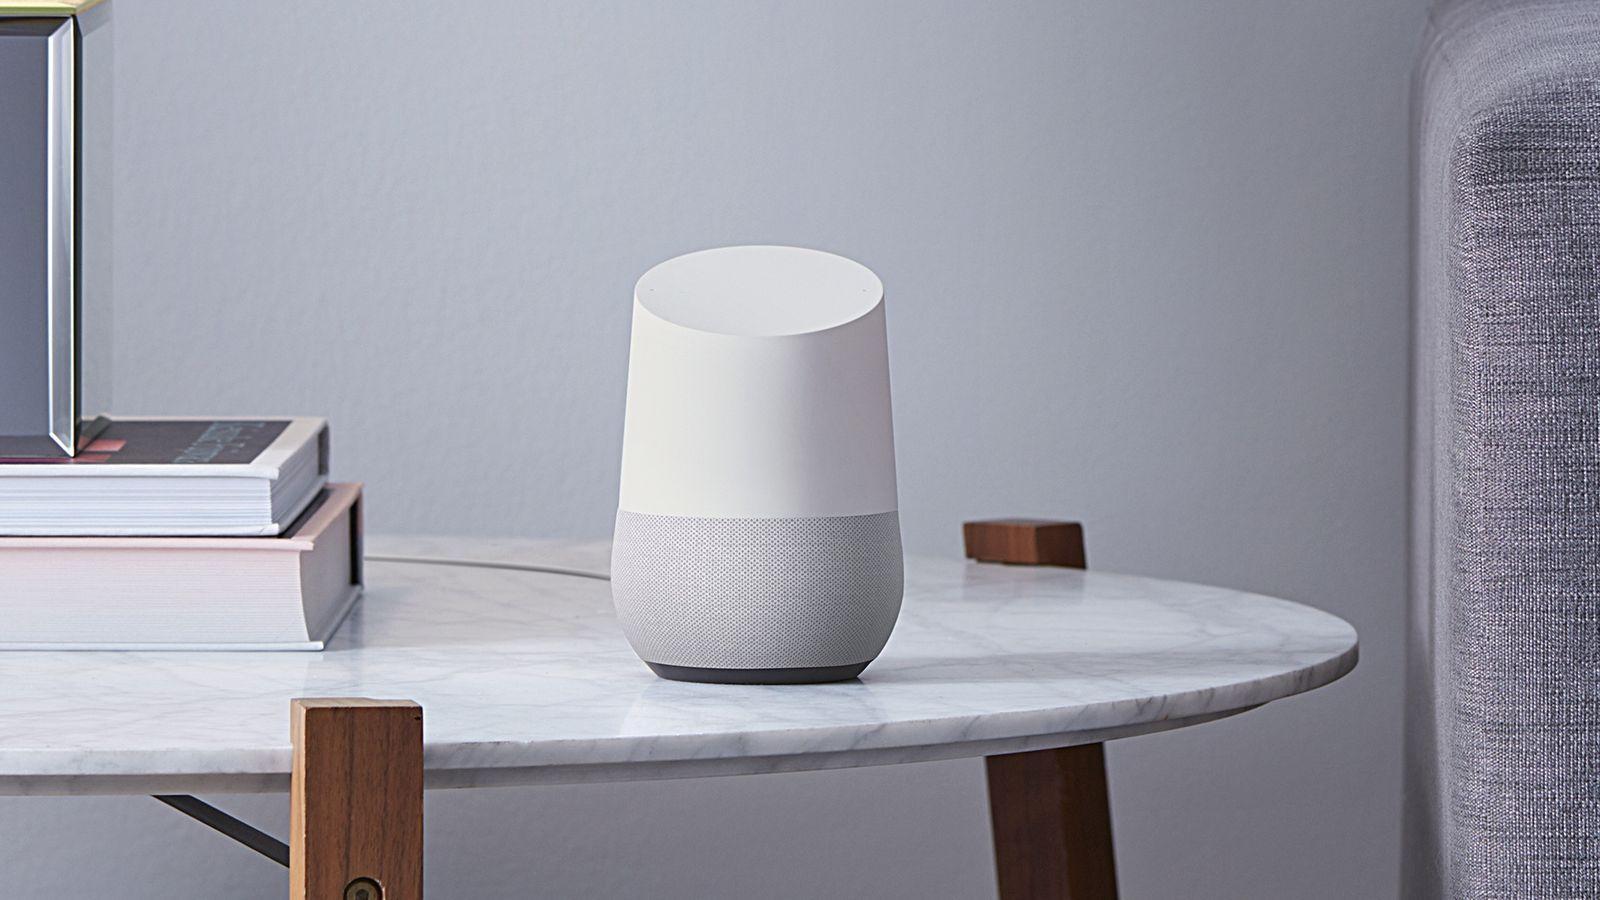 altavoces con Google Assistant